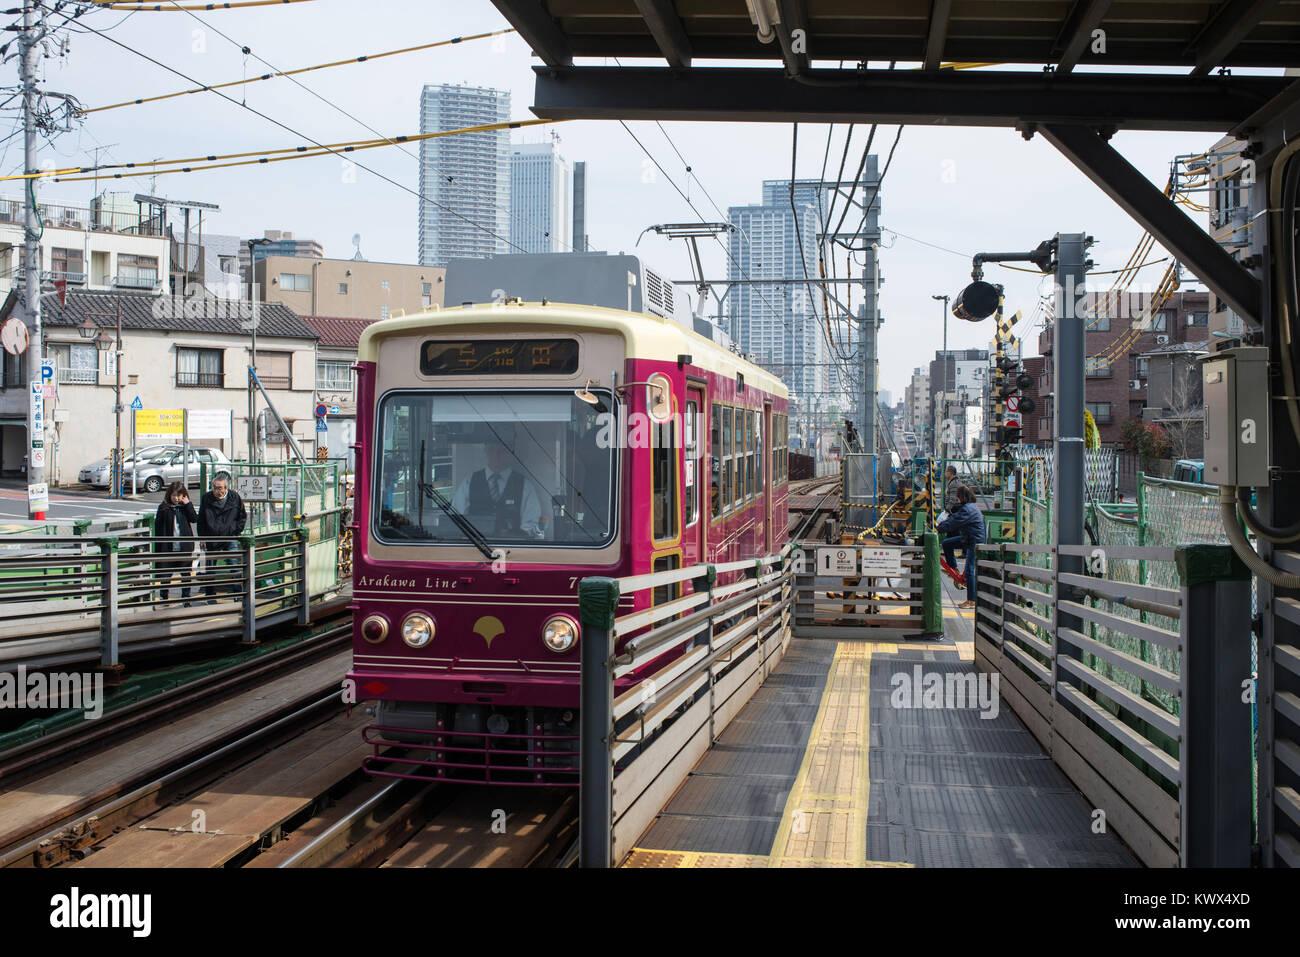 Japan, Tokyo: Kishibojin-mae subway station in the district of Toshima - Stock Image